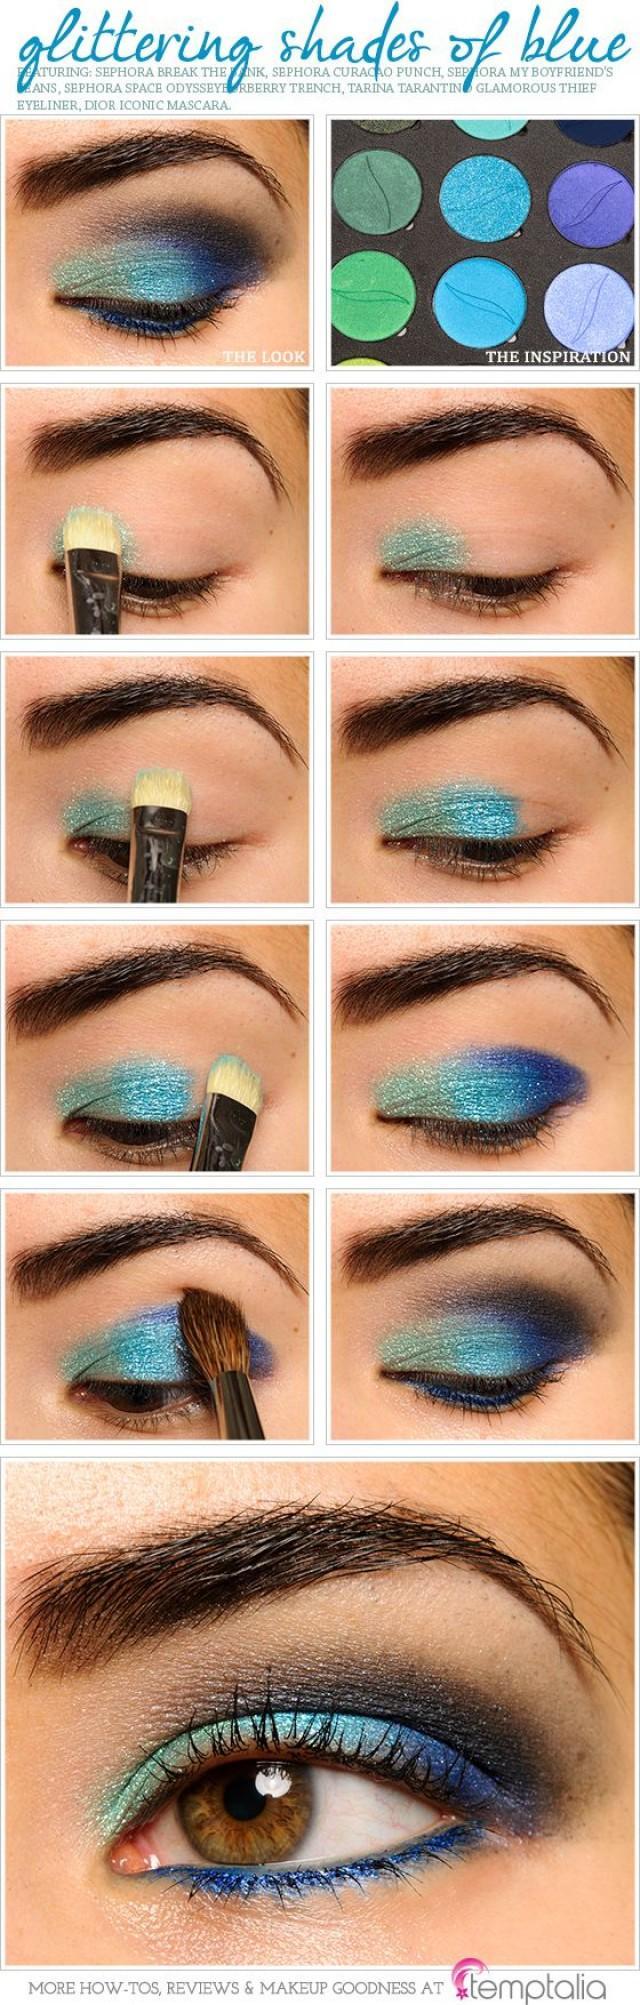 Sephora Break The Bank 11 Eyeshadow Review Photos Swatches 2367234